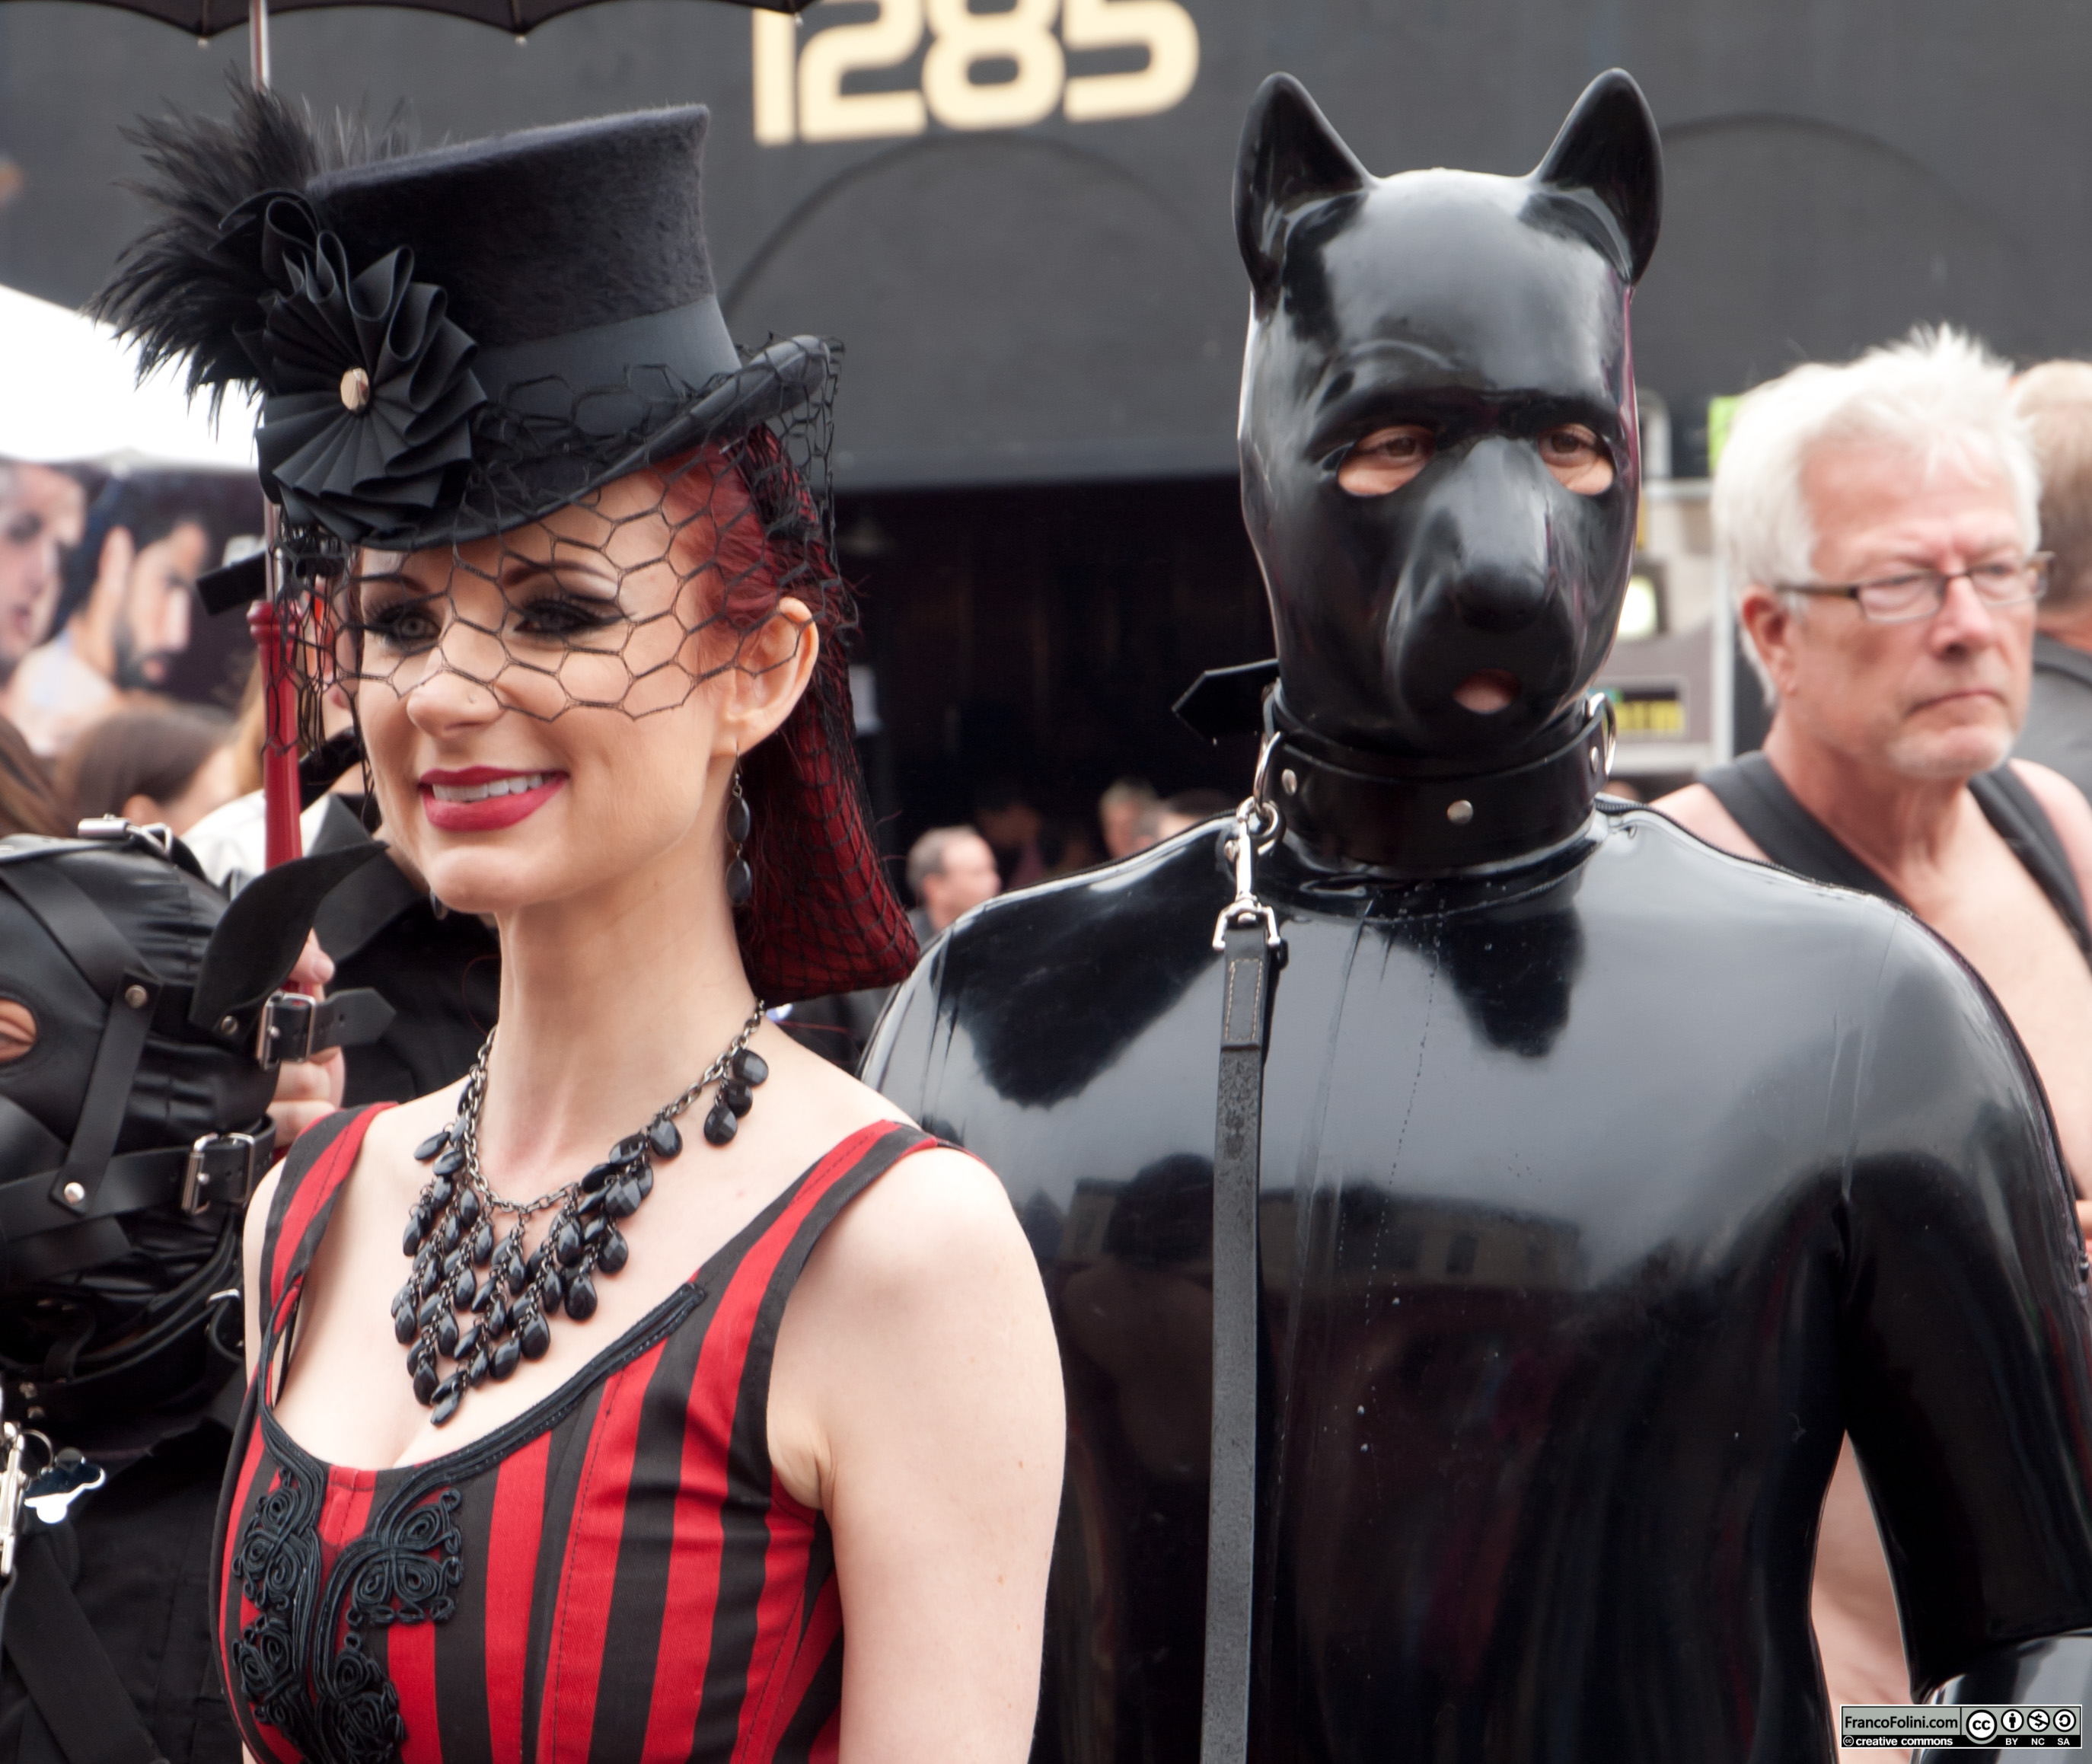 Liliane Hunt at the San Francisco Folsom Street Fair 2011